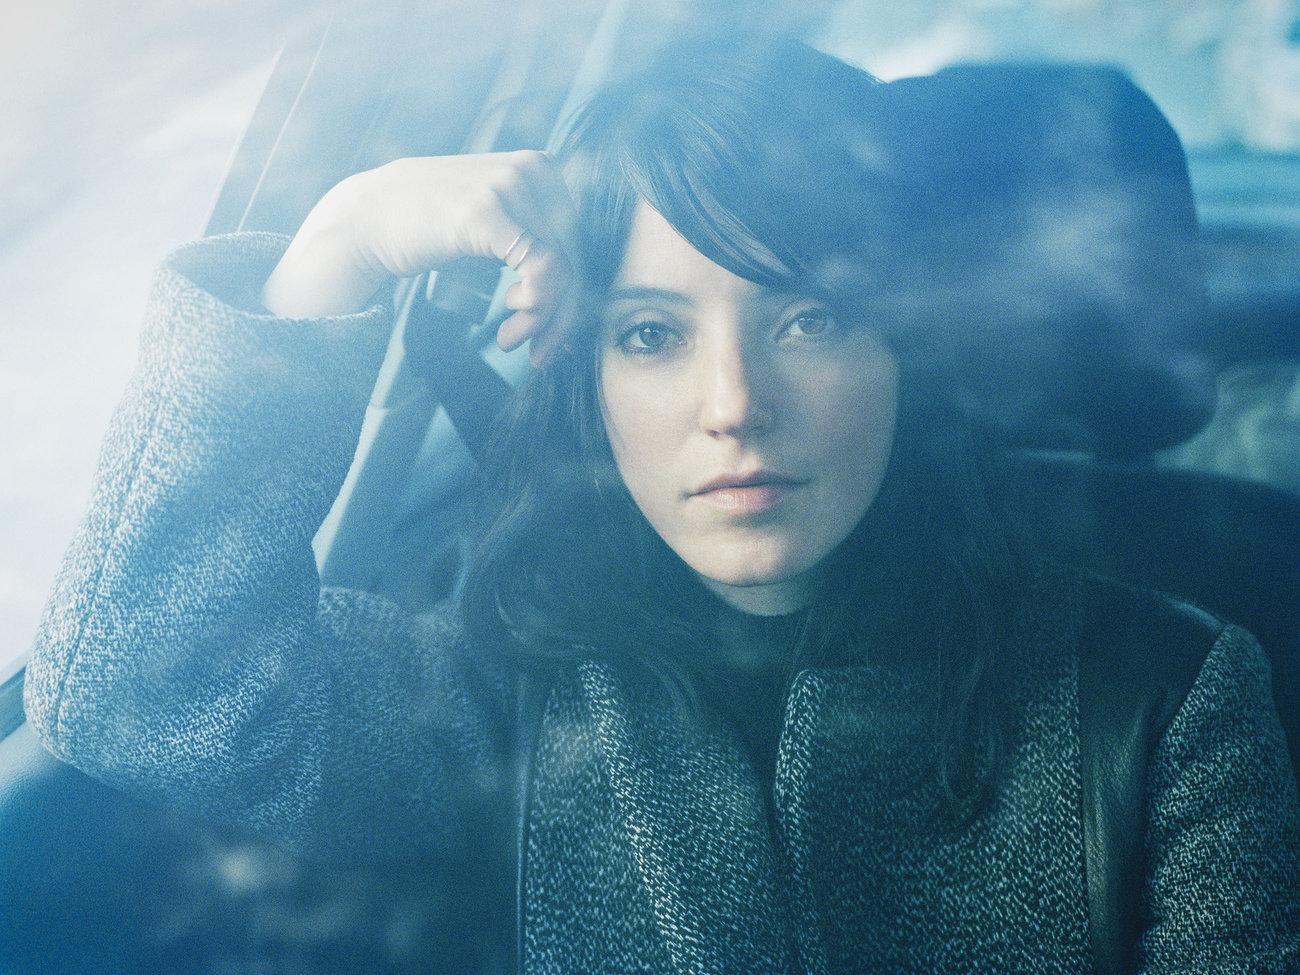 Mundo Musique: Stream Sharon Van Etten's upcoming record 'Are We There'